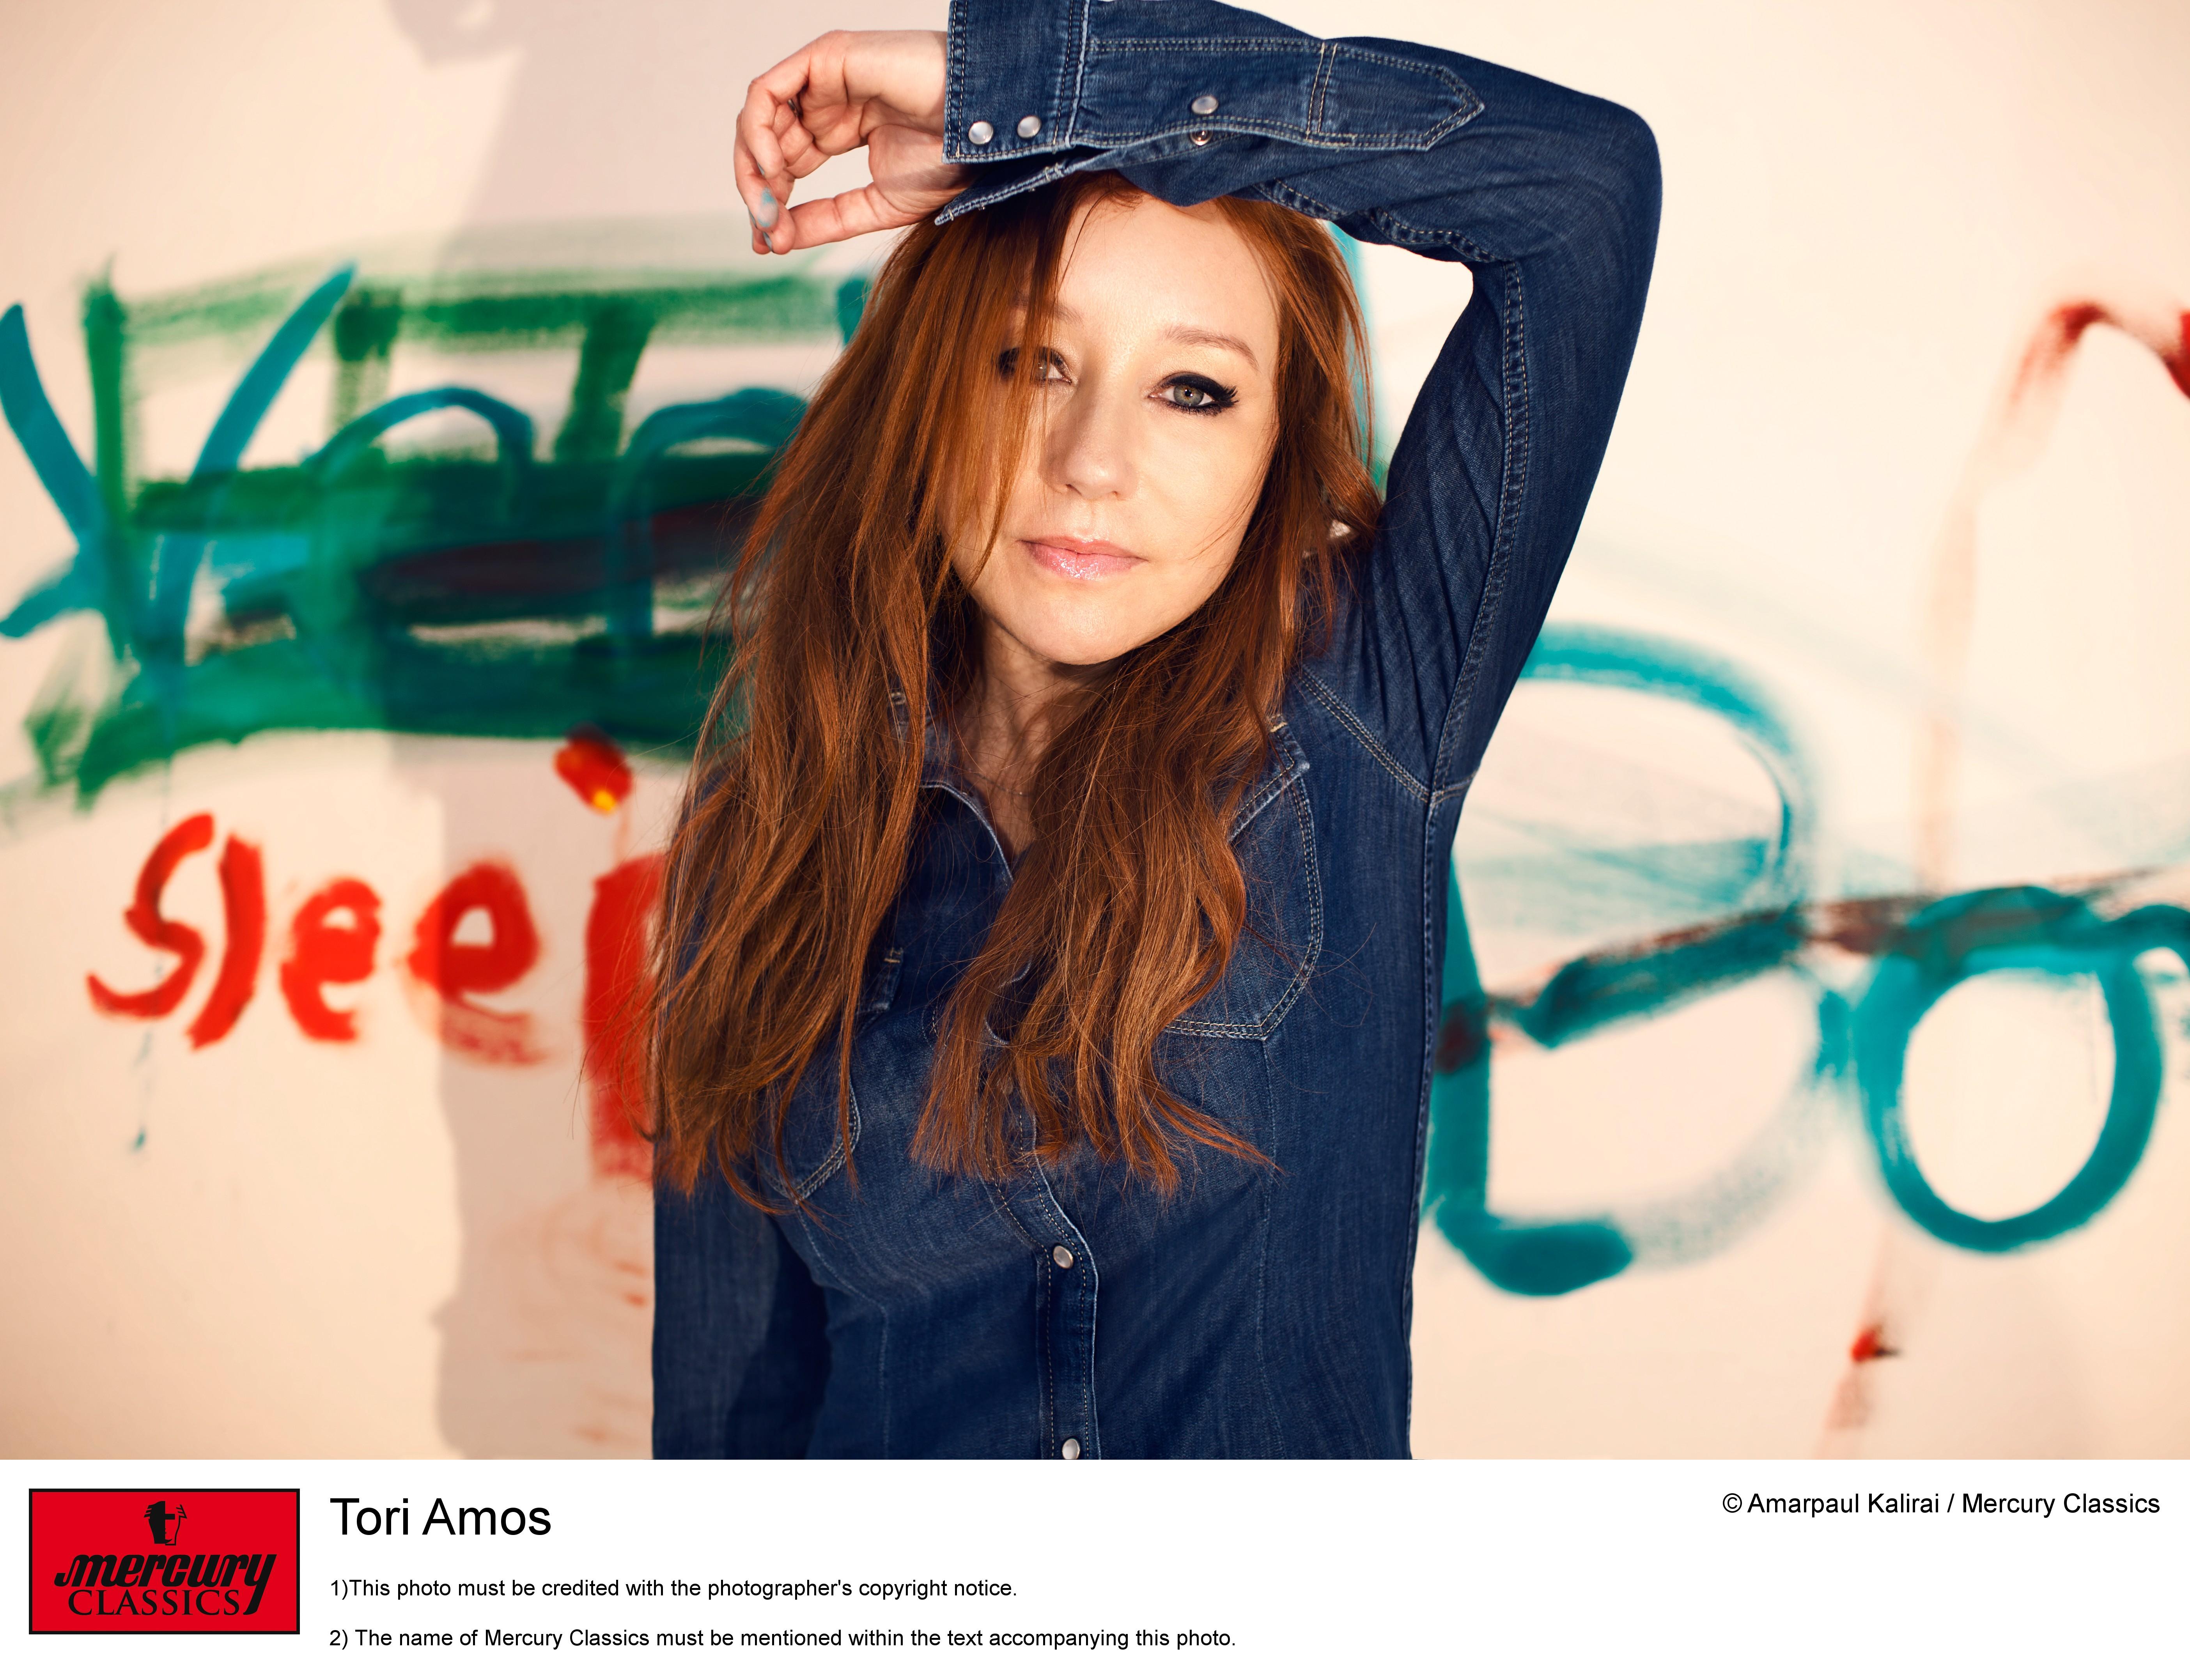 Tori_Amos_2014_Publicity_IMG-1576 (1)